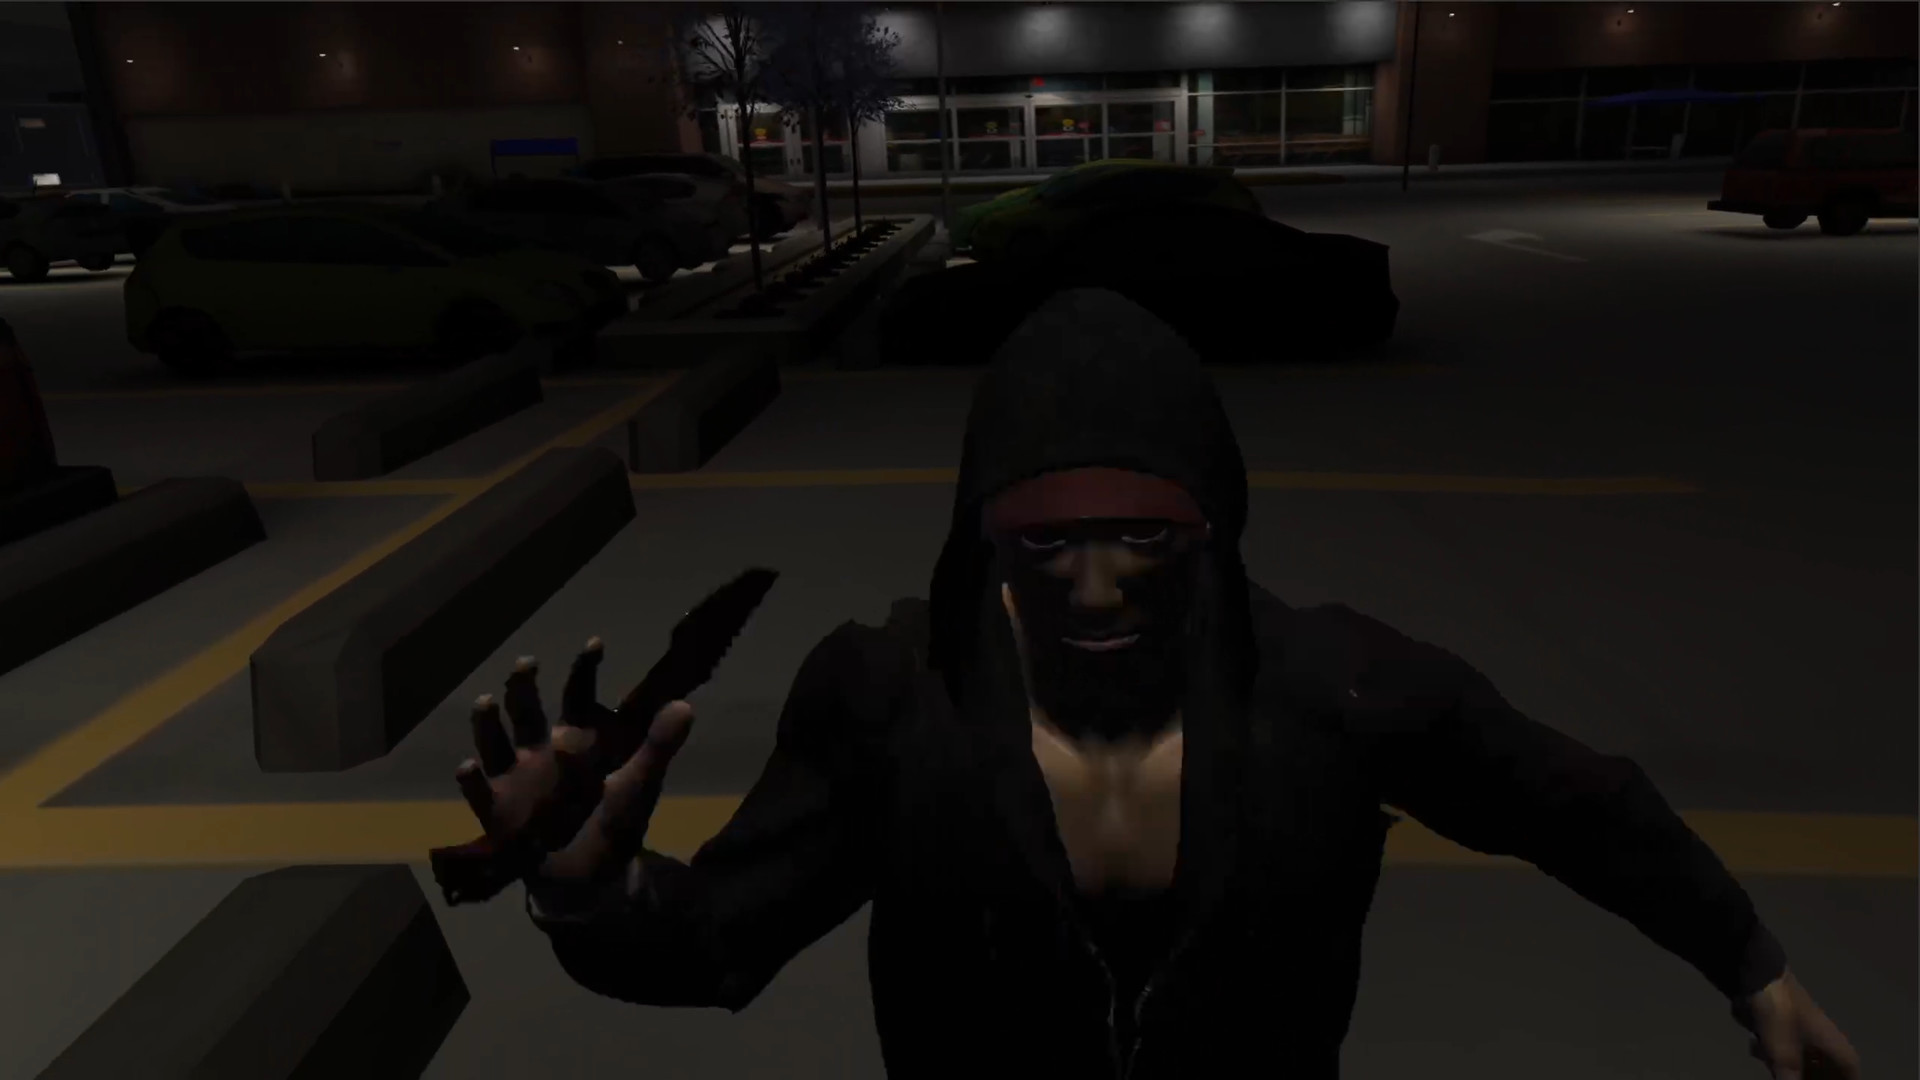 Oculus Quest 游戏《SETVR VR》防卫模拟插图(2)